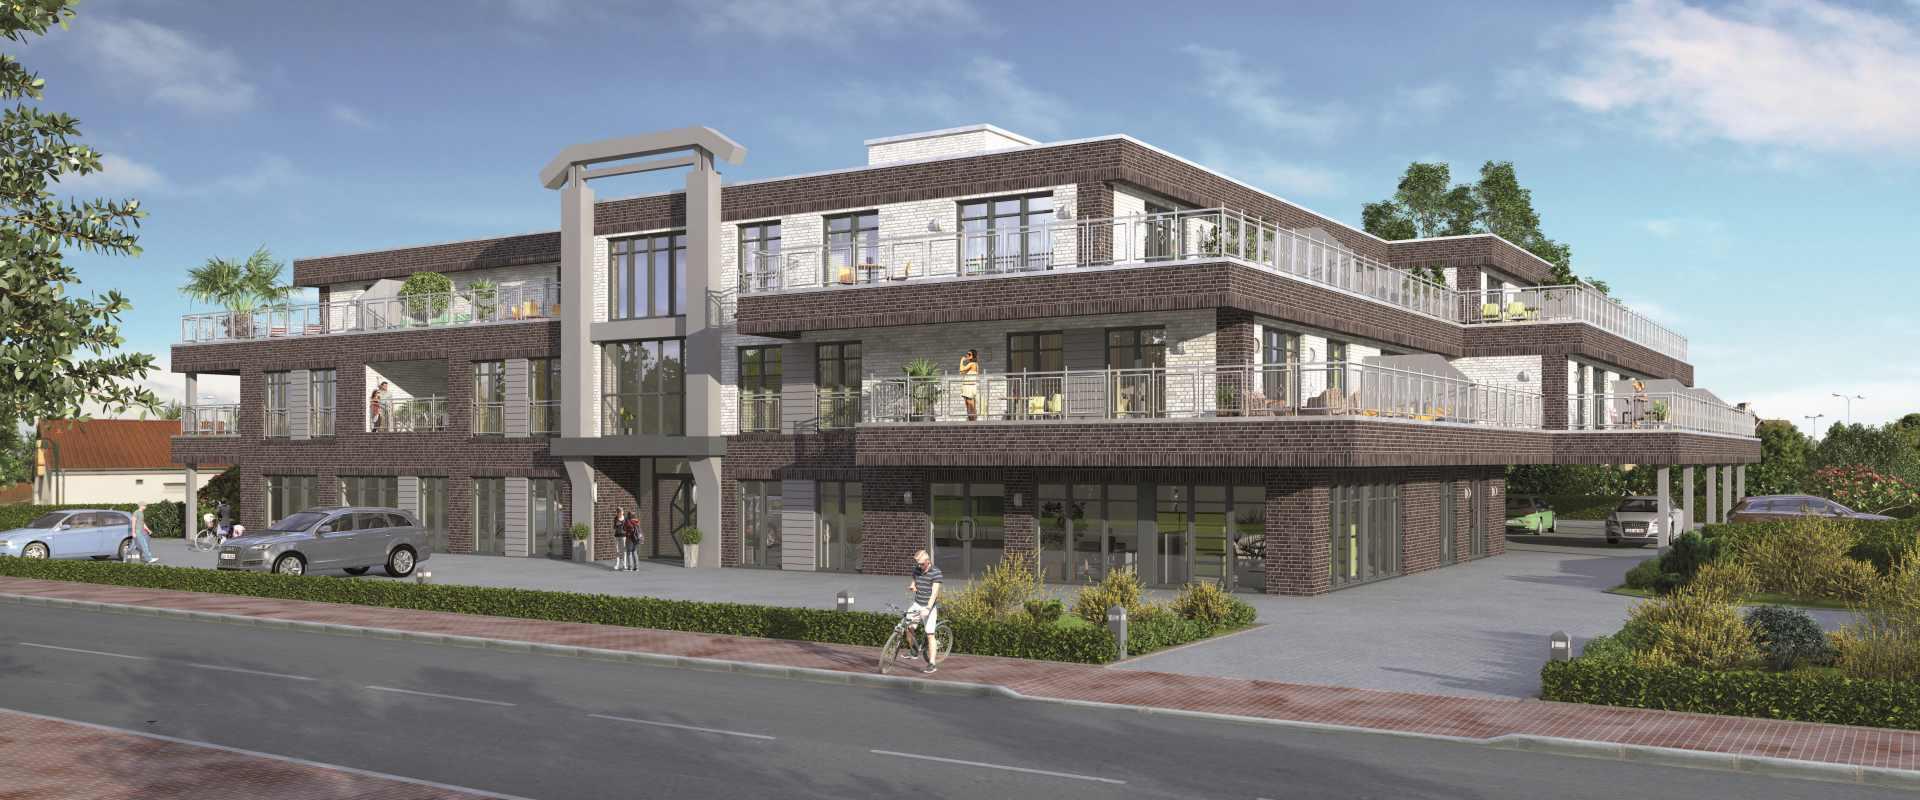 NIBO-Immobilien Projekt Cappeln